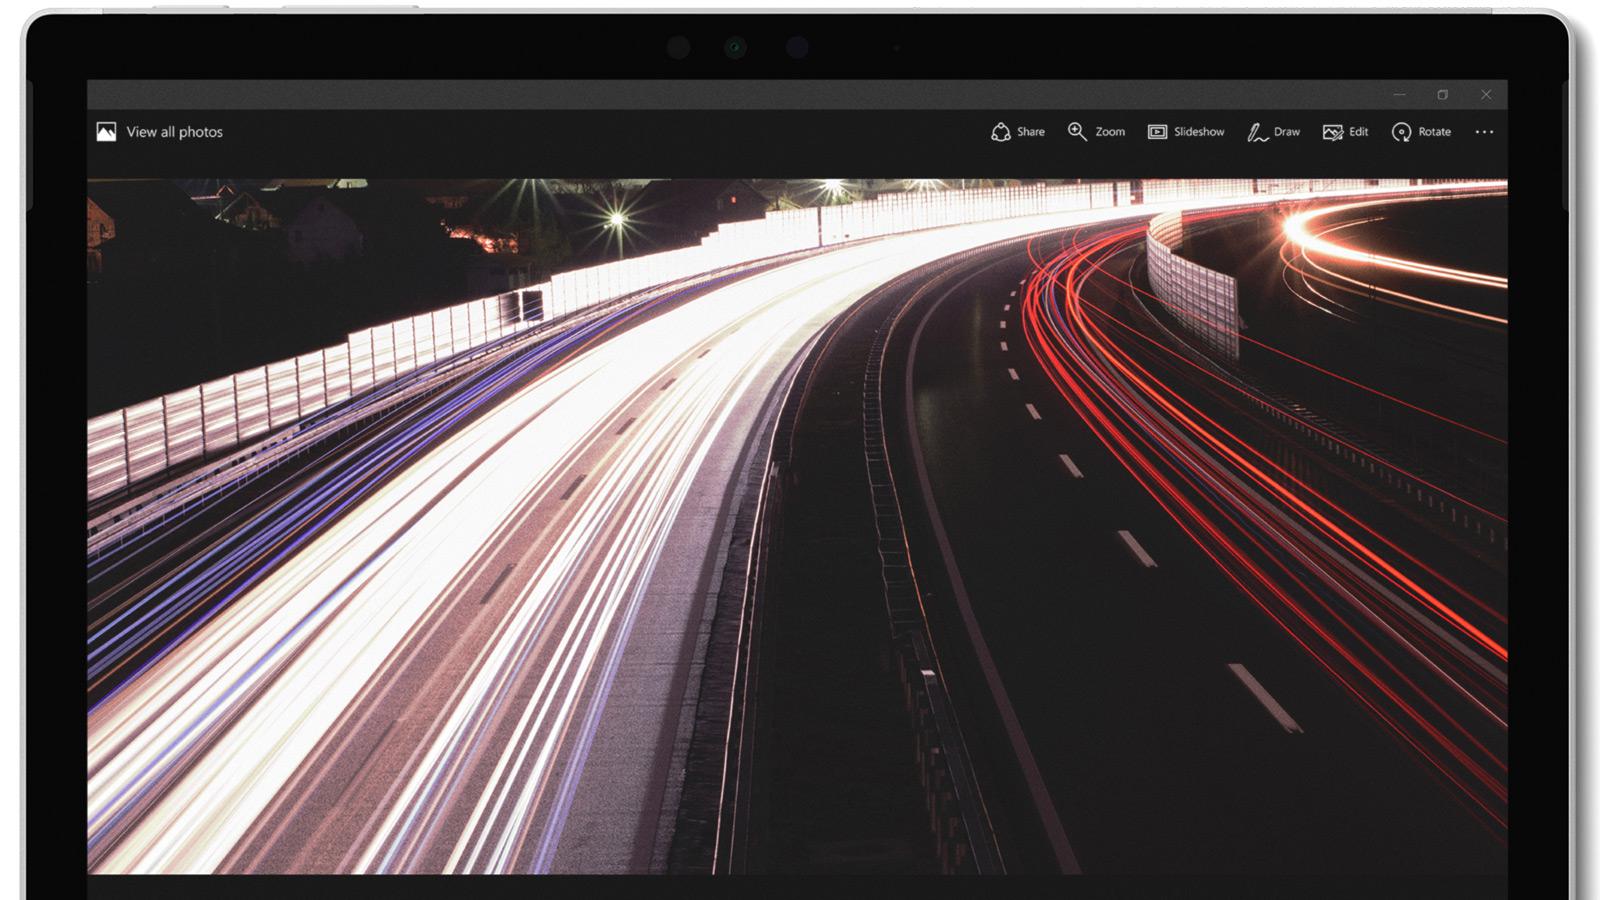 Surface Pro 的 12.3 吋 PixelSense? 顯示器擁有鮮明的色彩及銳利的解析度。